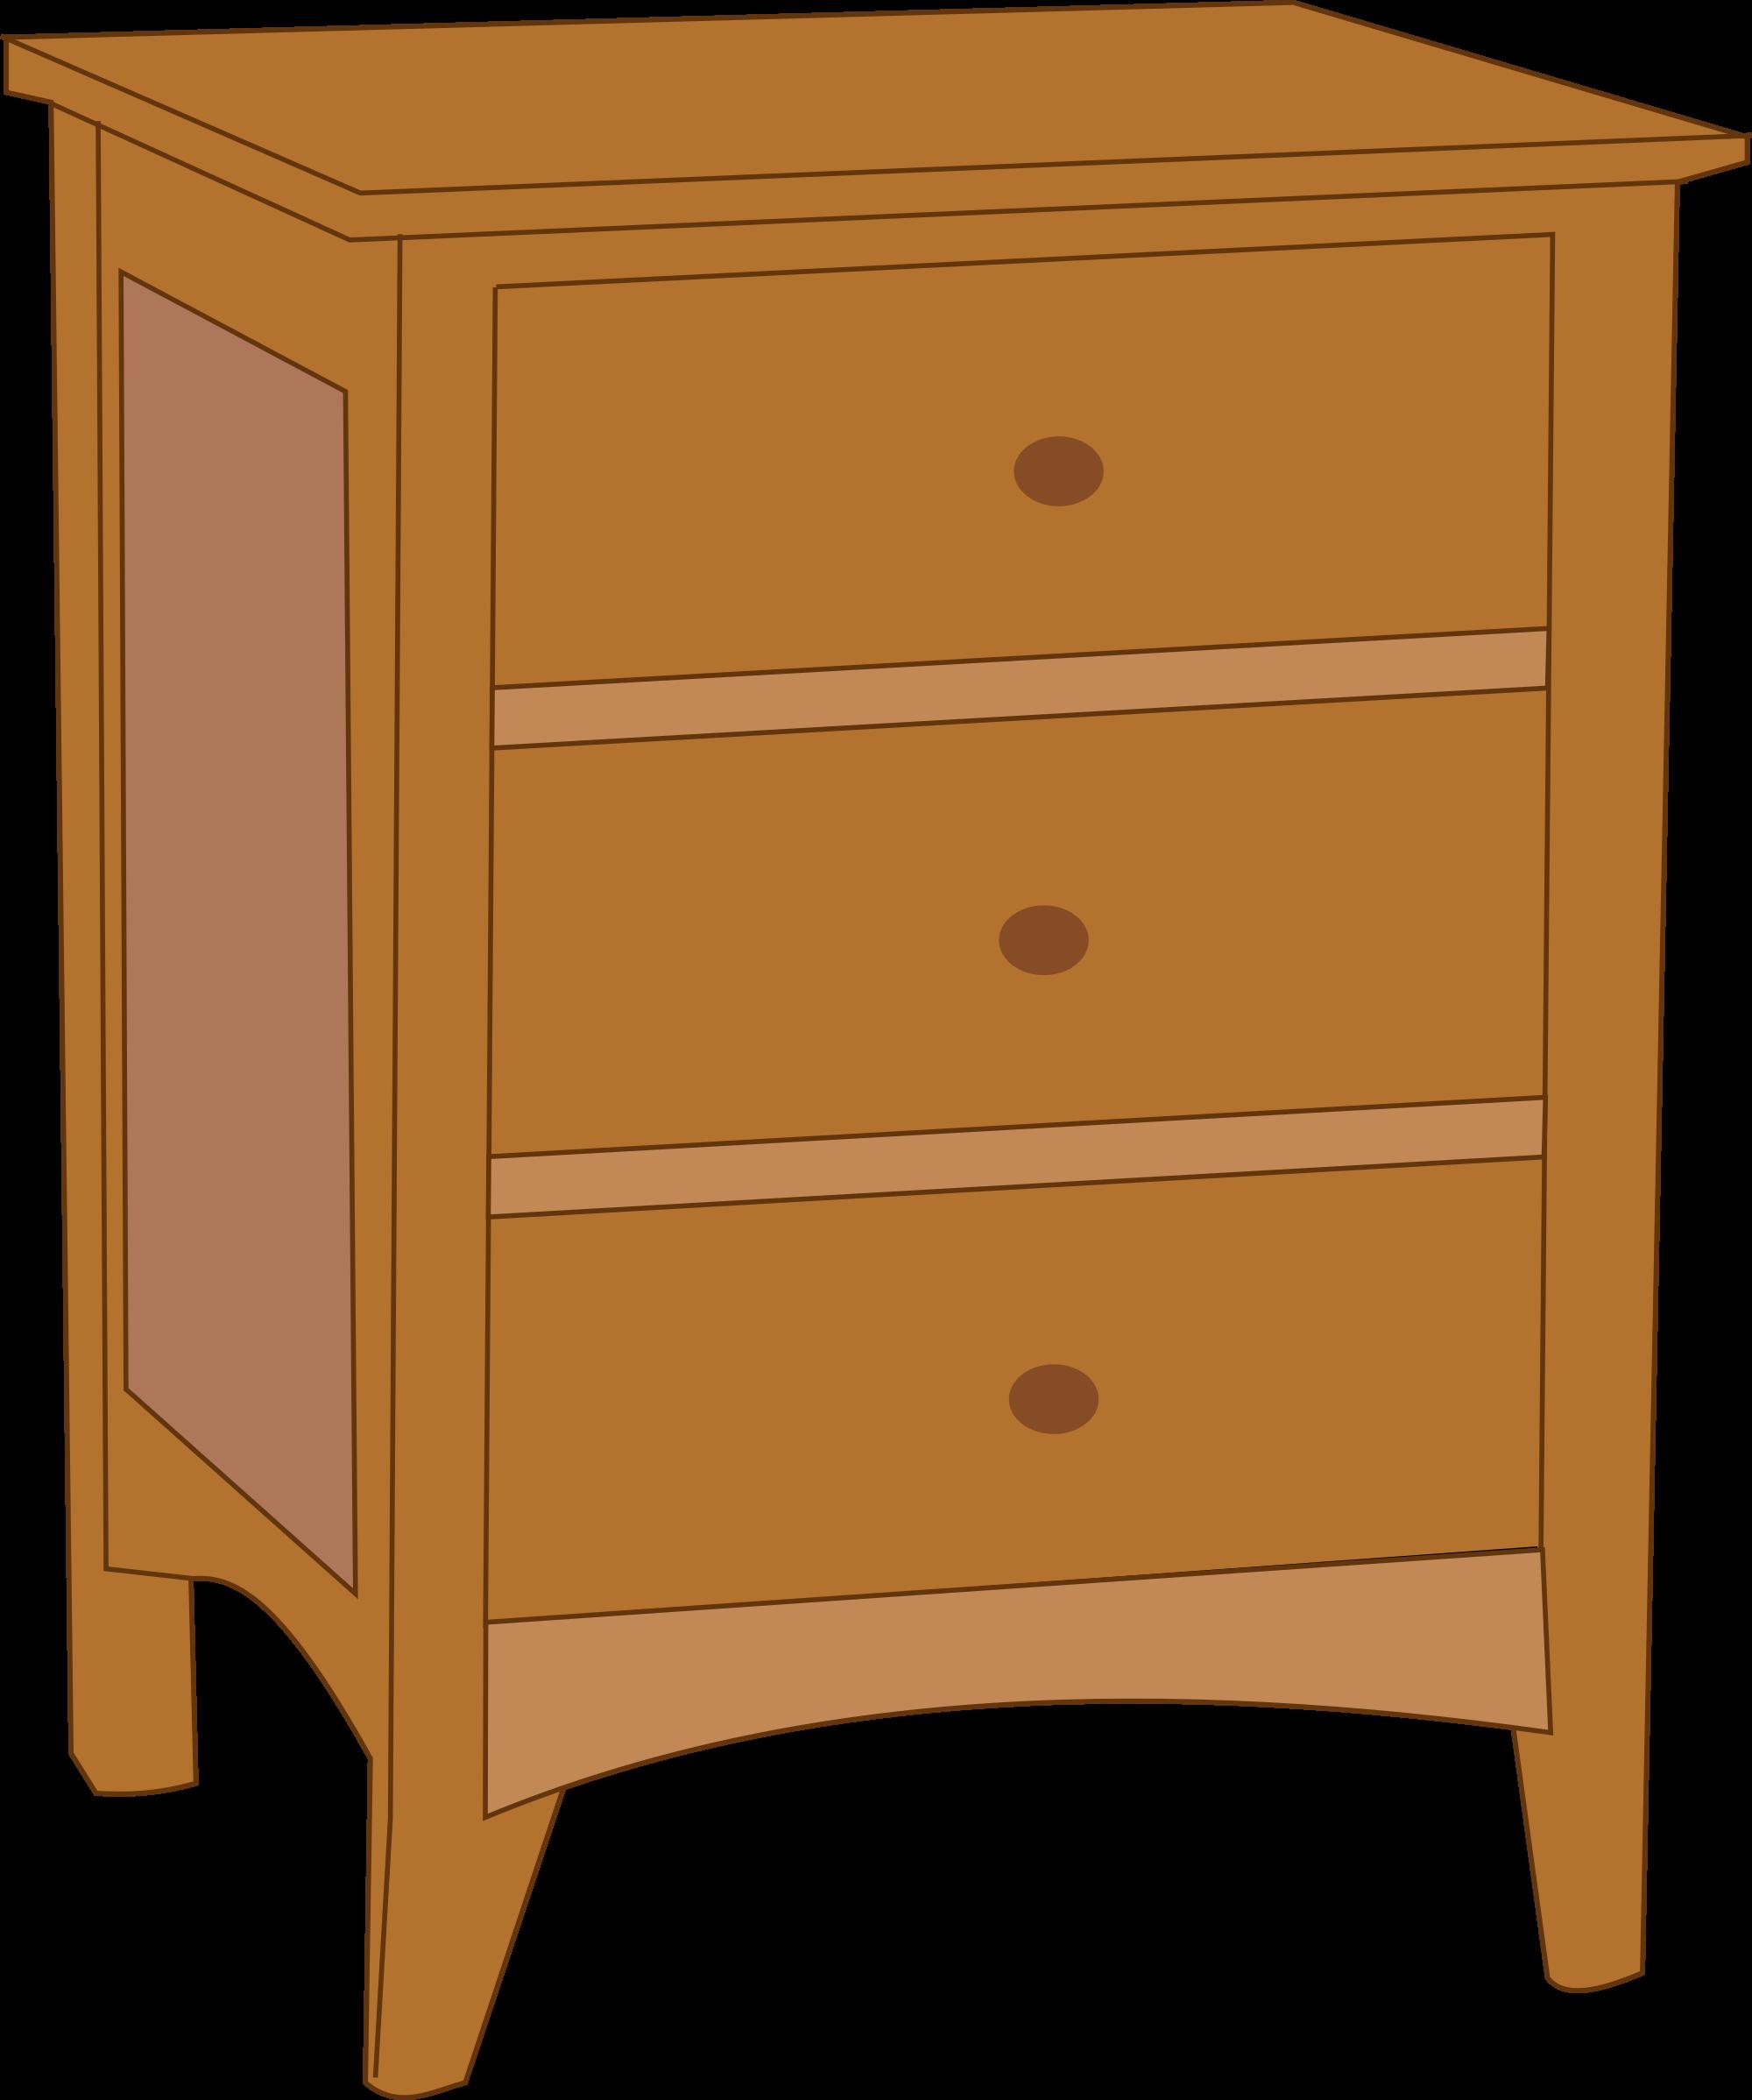 jpg transparent library Bedroom Drawers Cartoon